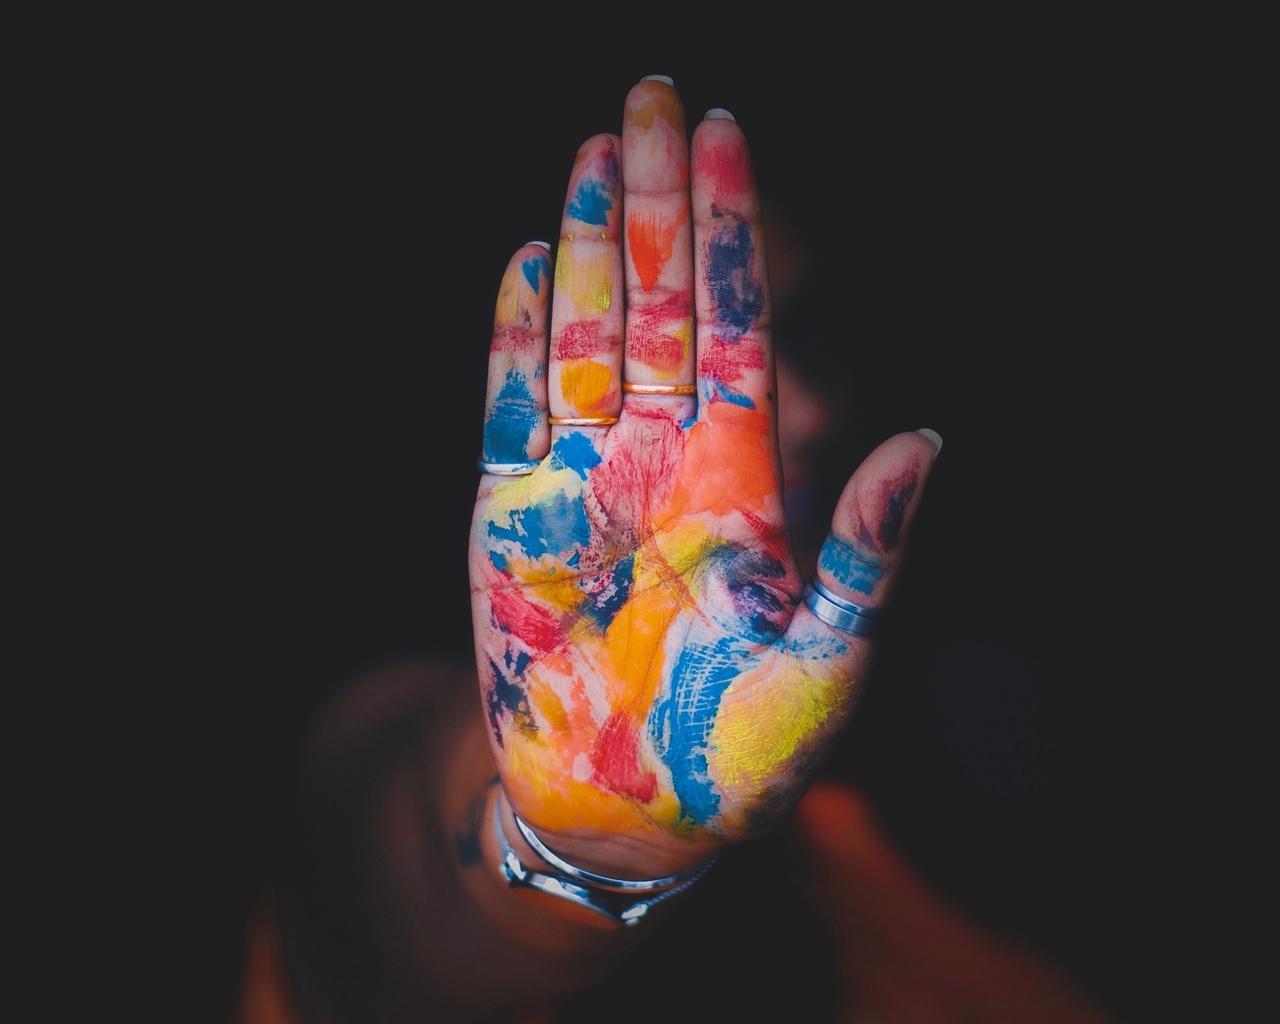 рука, предметы, краска, aashish r gautam